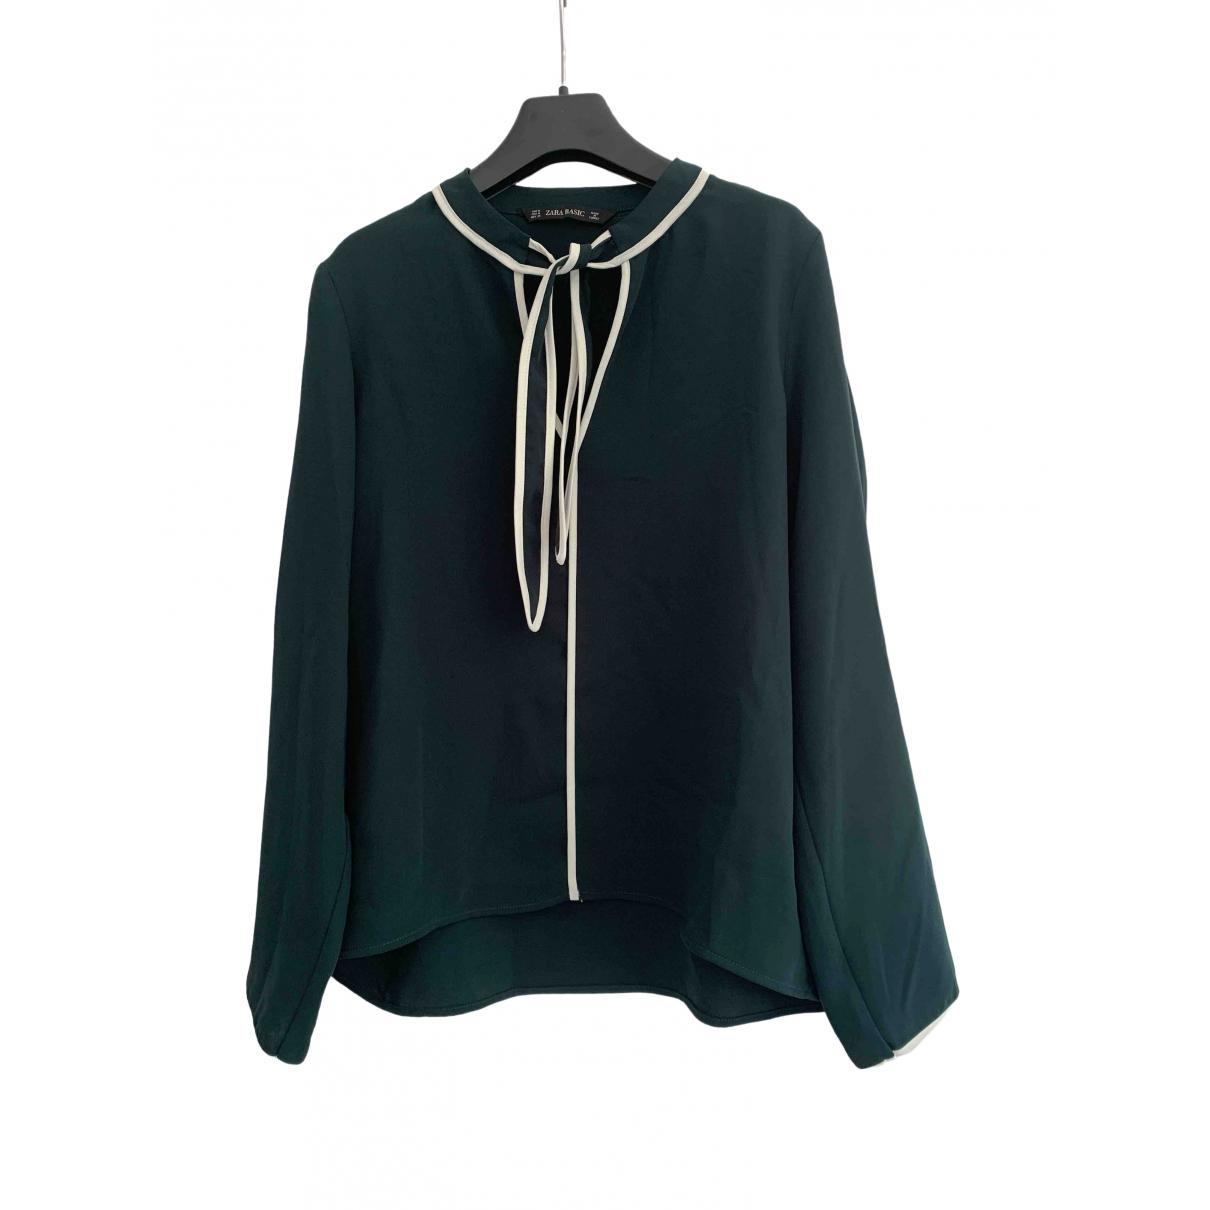 Zara \N Green  top for Women 40 FR